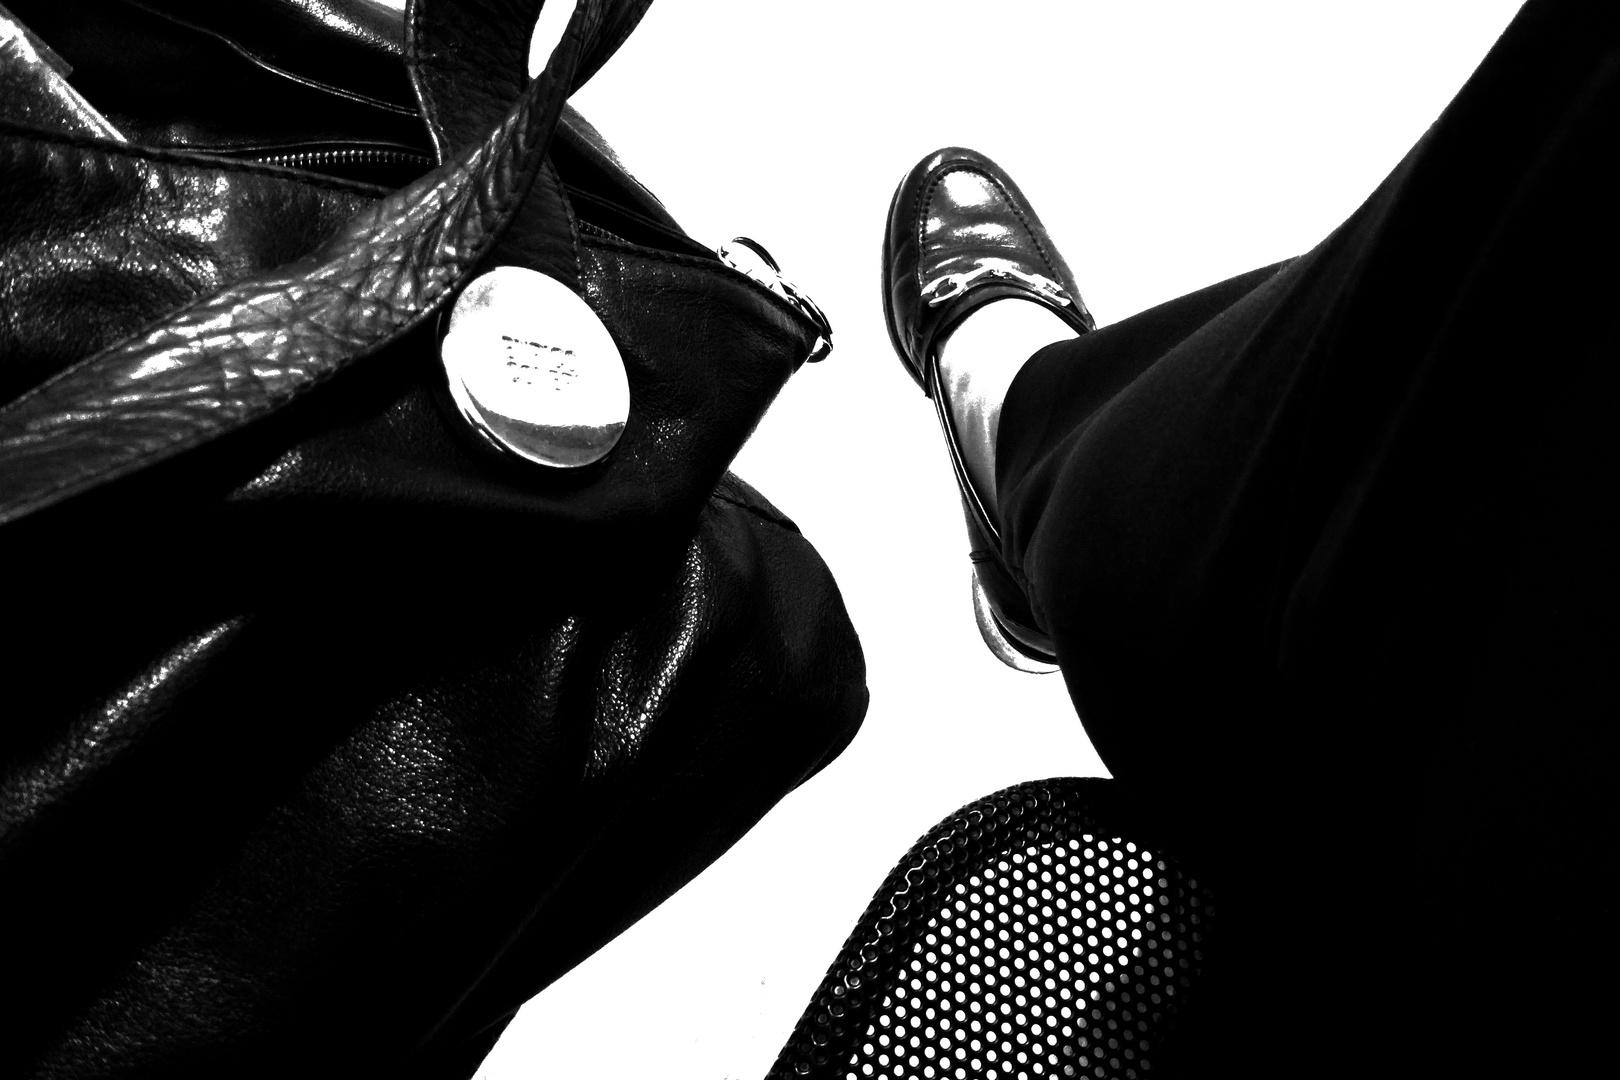 ..waiting room...